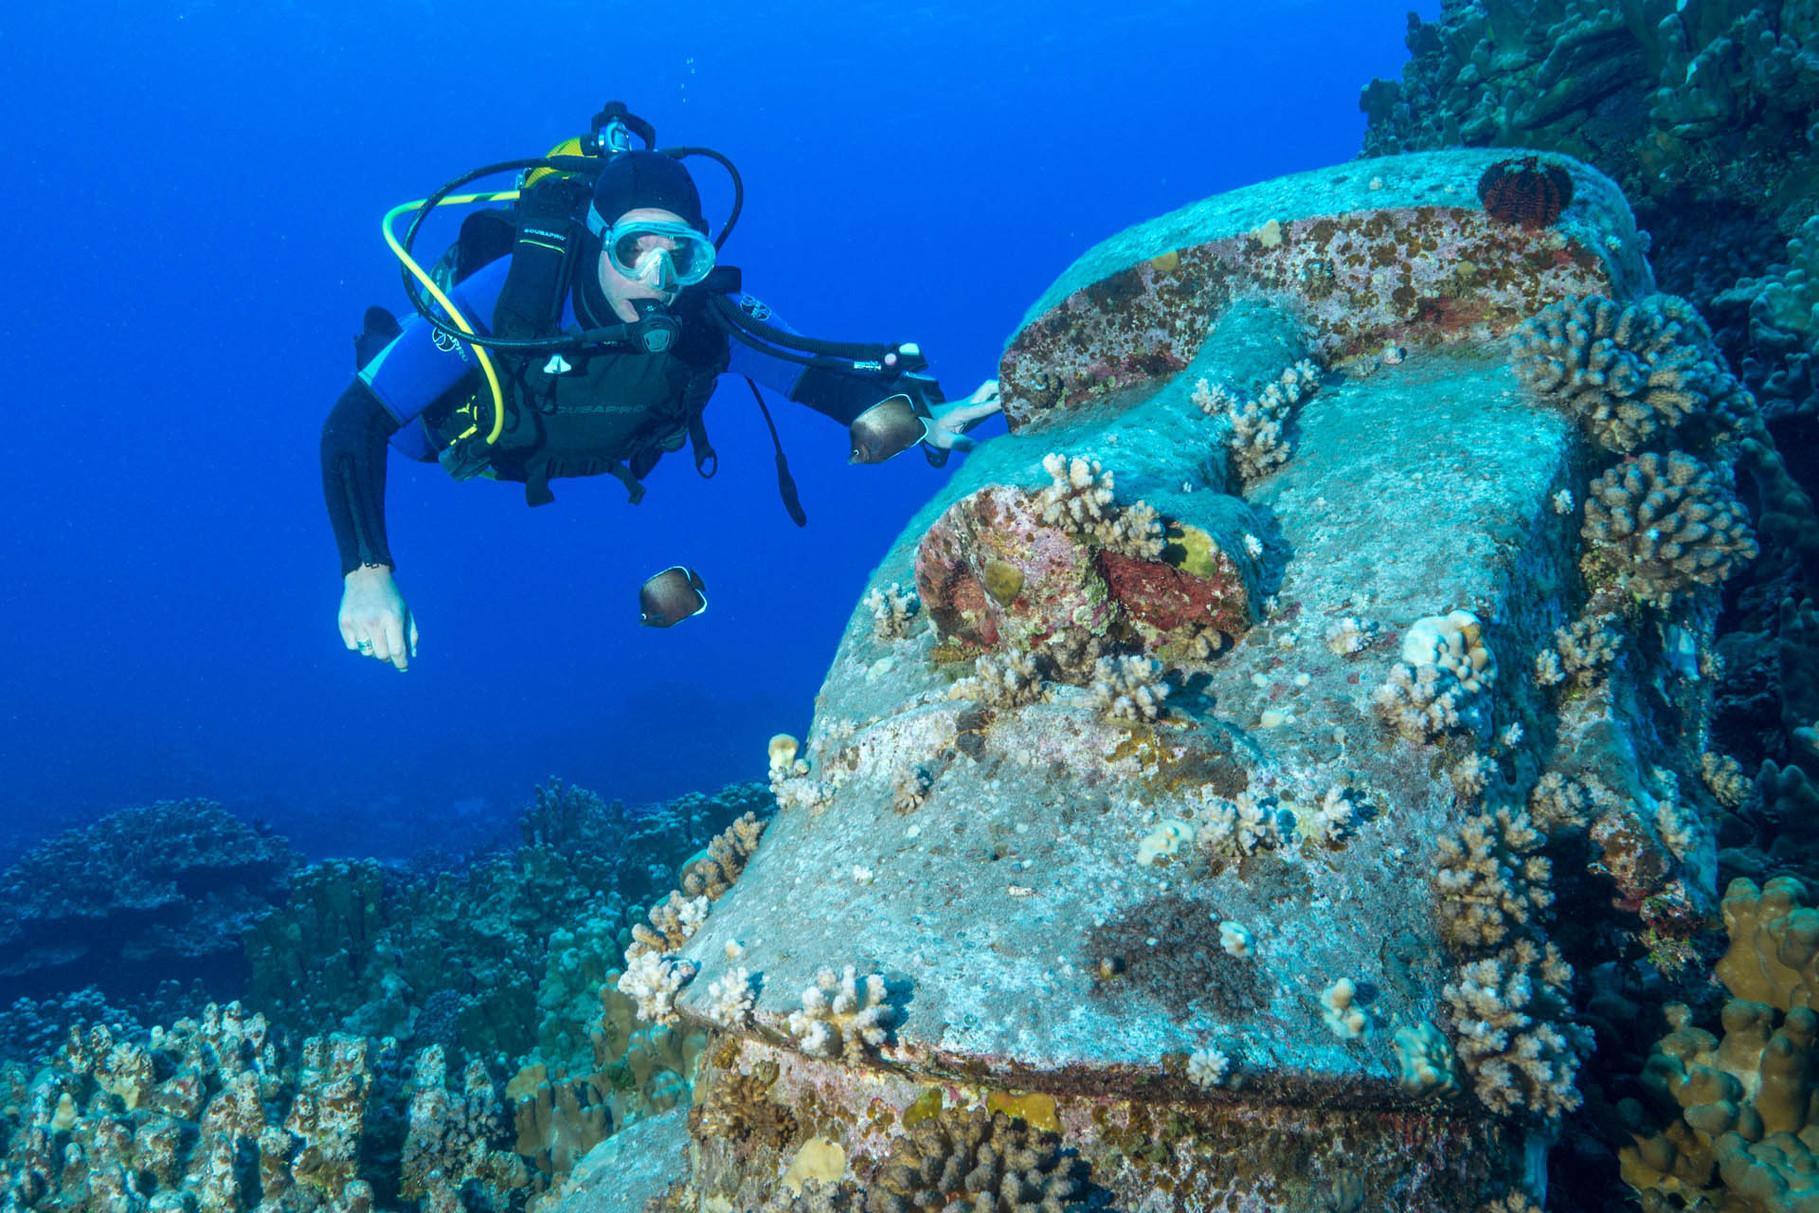 Replica Moai and diver